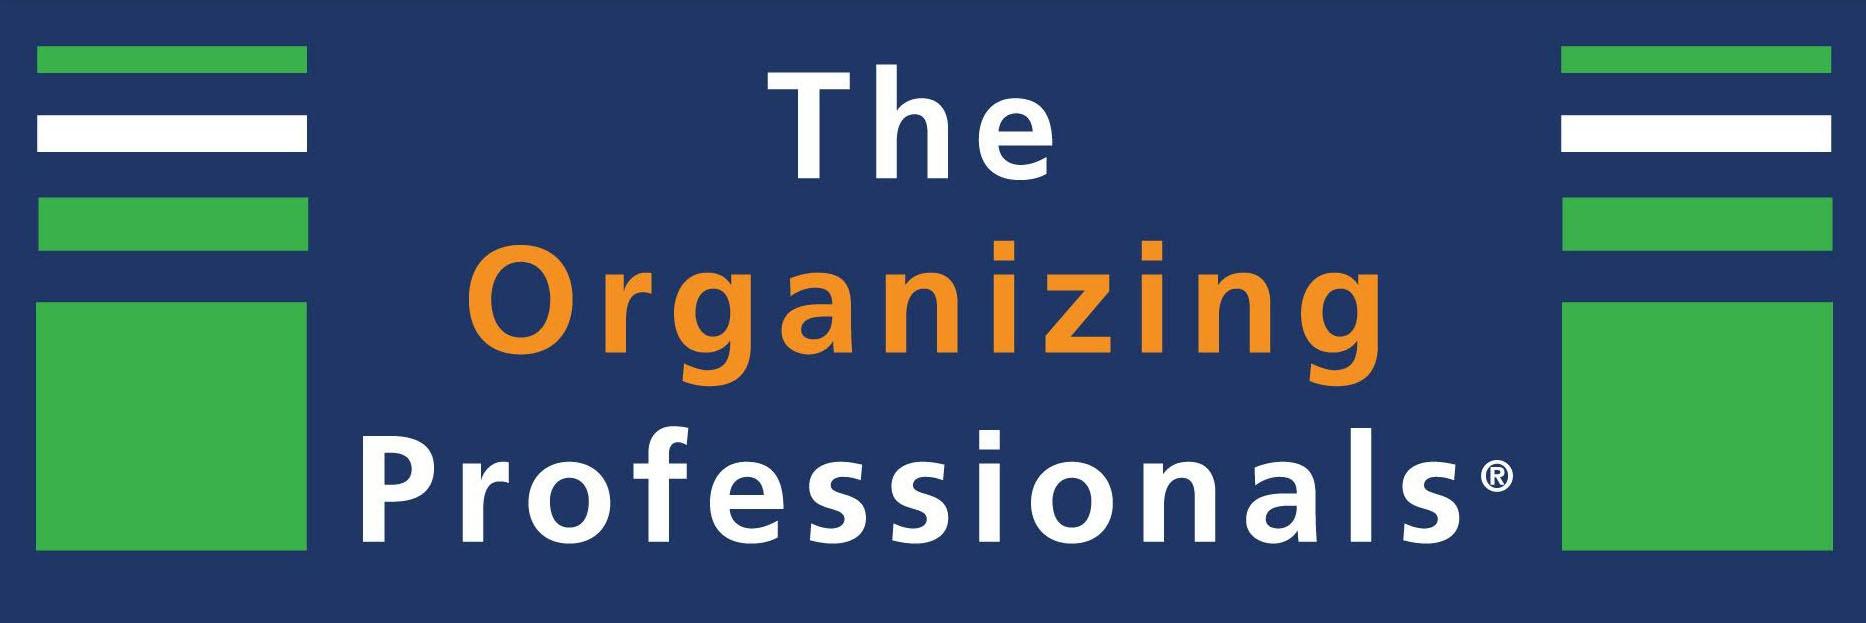 The Organizing Professionals